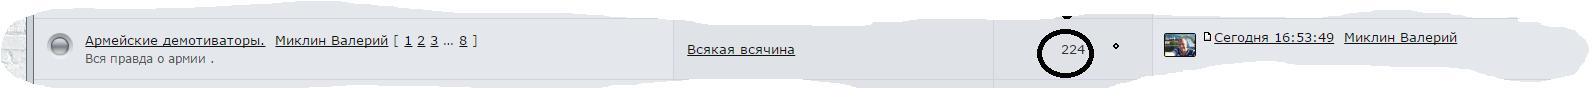 http://sa.uploads.ru/2UM4m.png